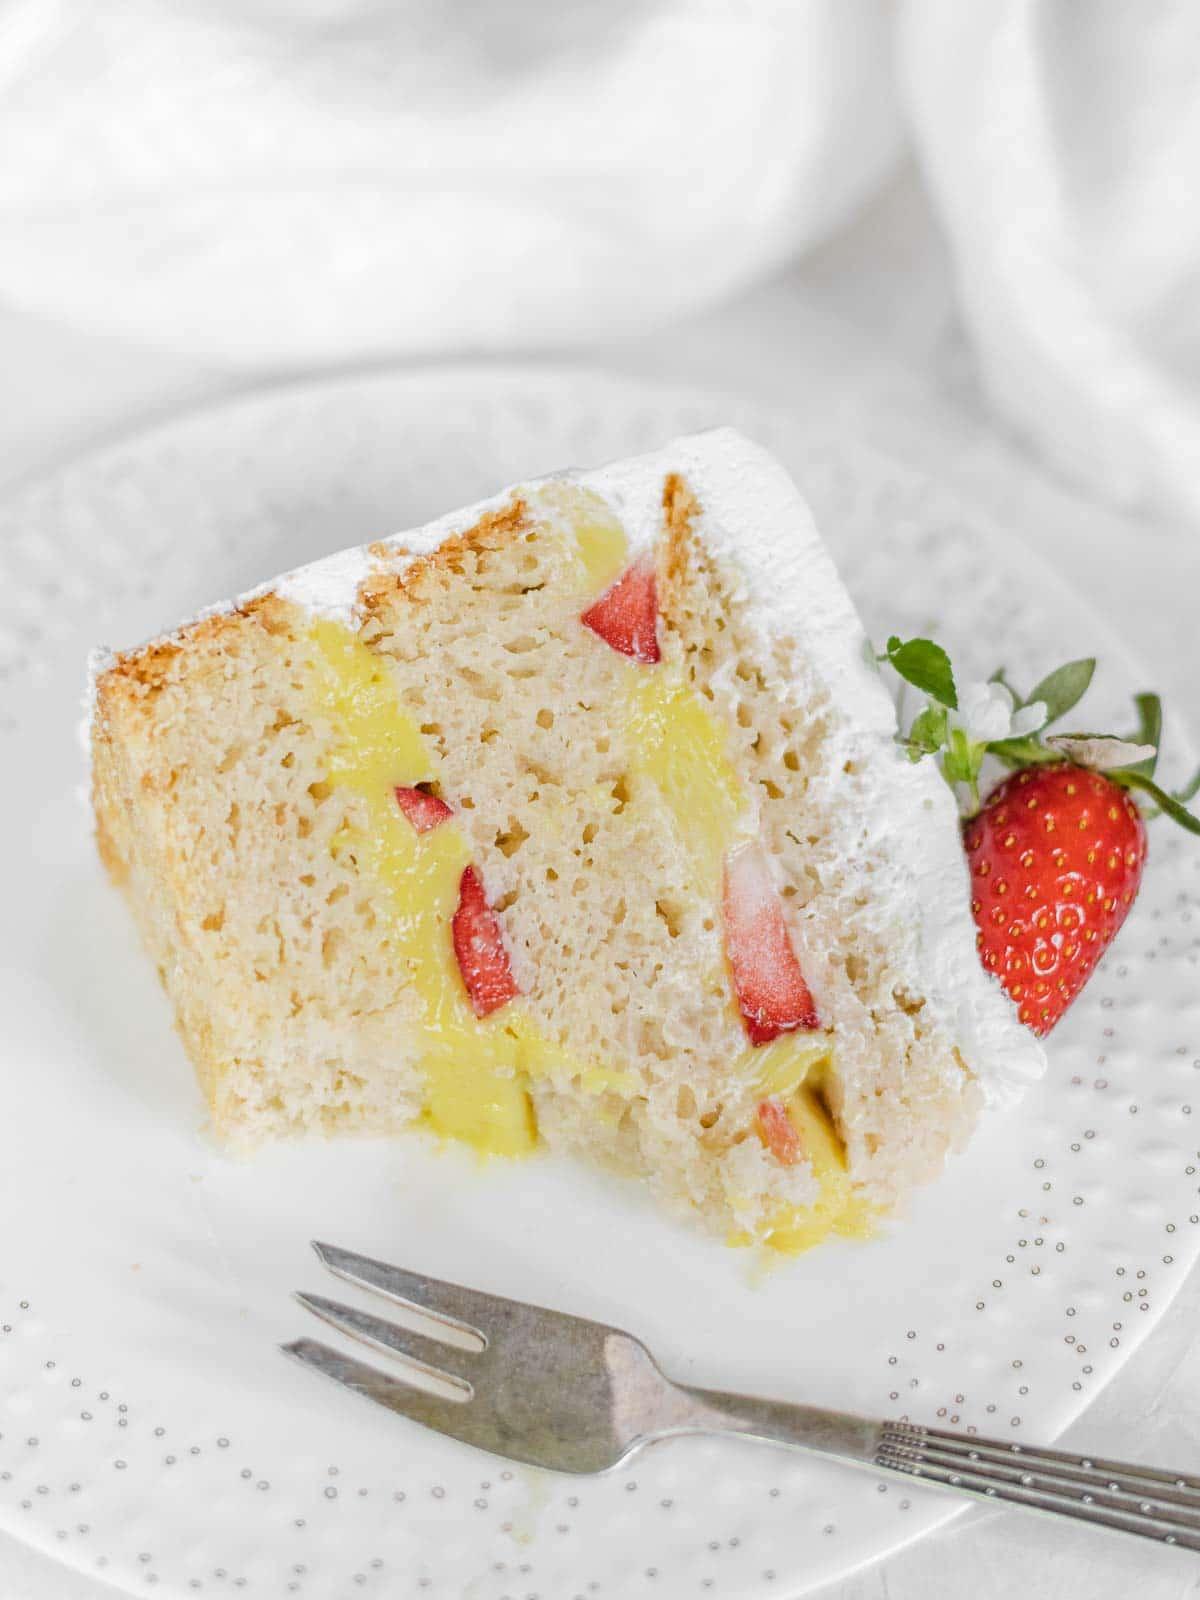 bitten off slice of cake with strawberries